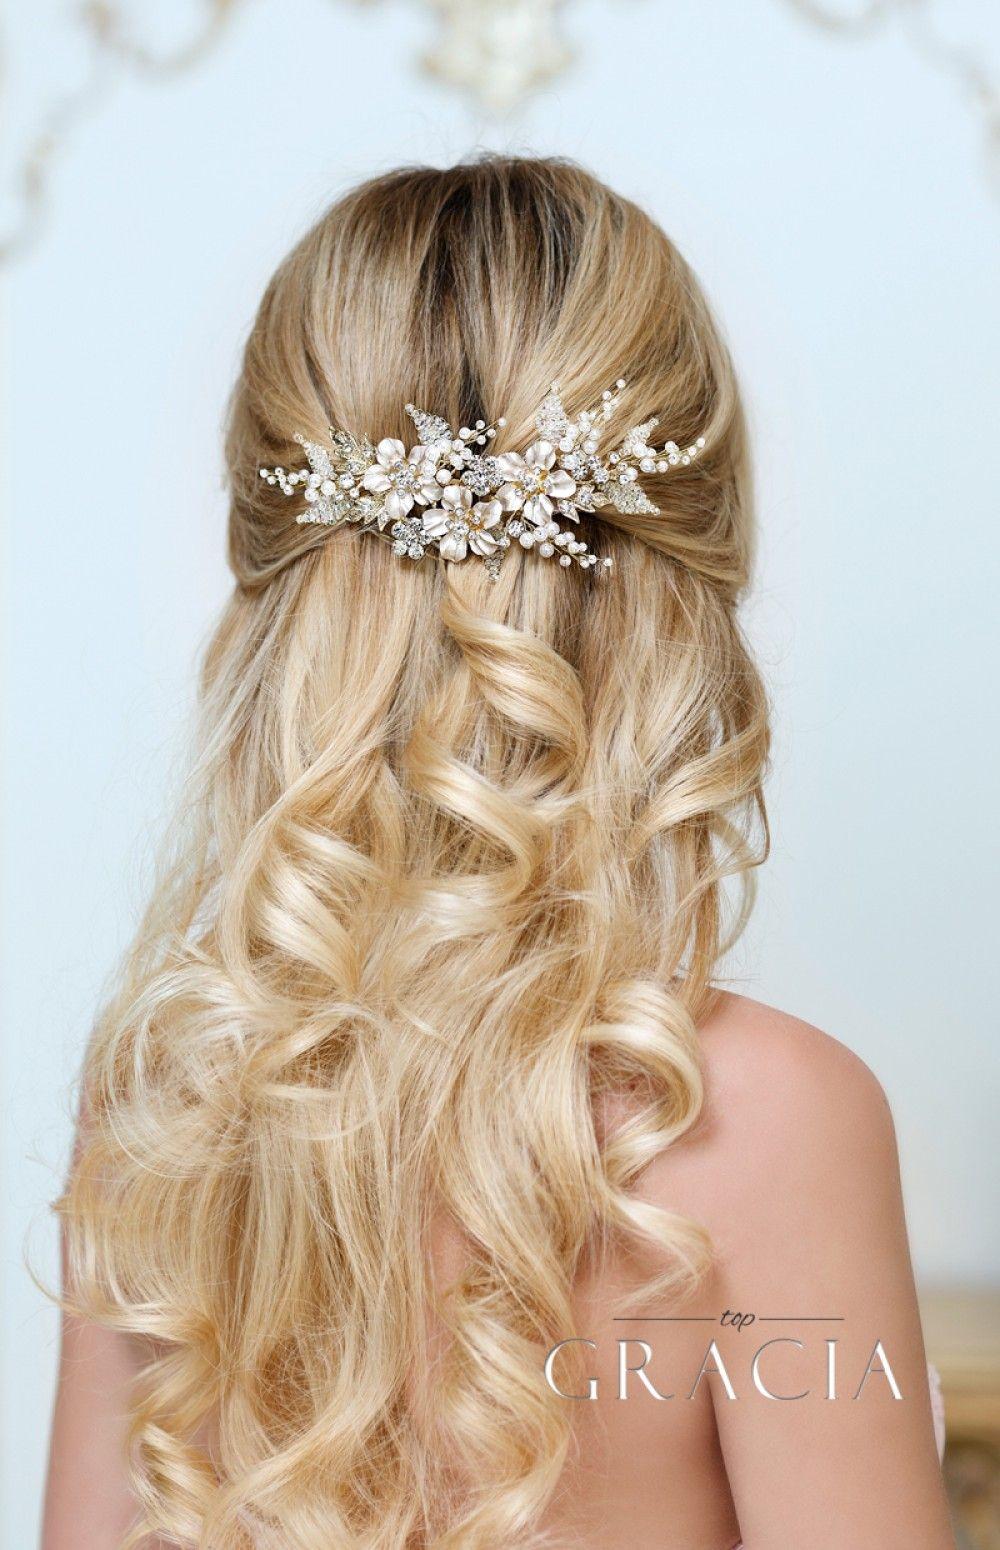 Navy Rhinestone Comb Bridal Hair Piece Blue Bridal Comb Wedding Headpiece Rhinestone Wedding Hair Comb Vintage Bride Hair Accessory